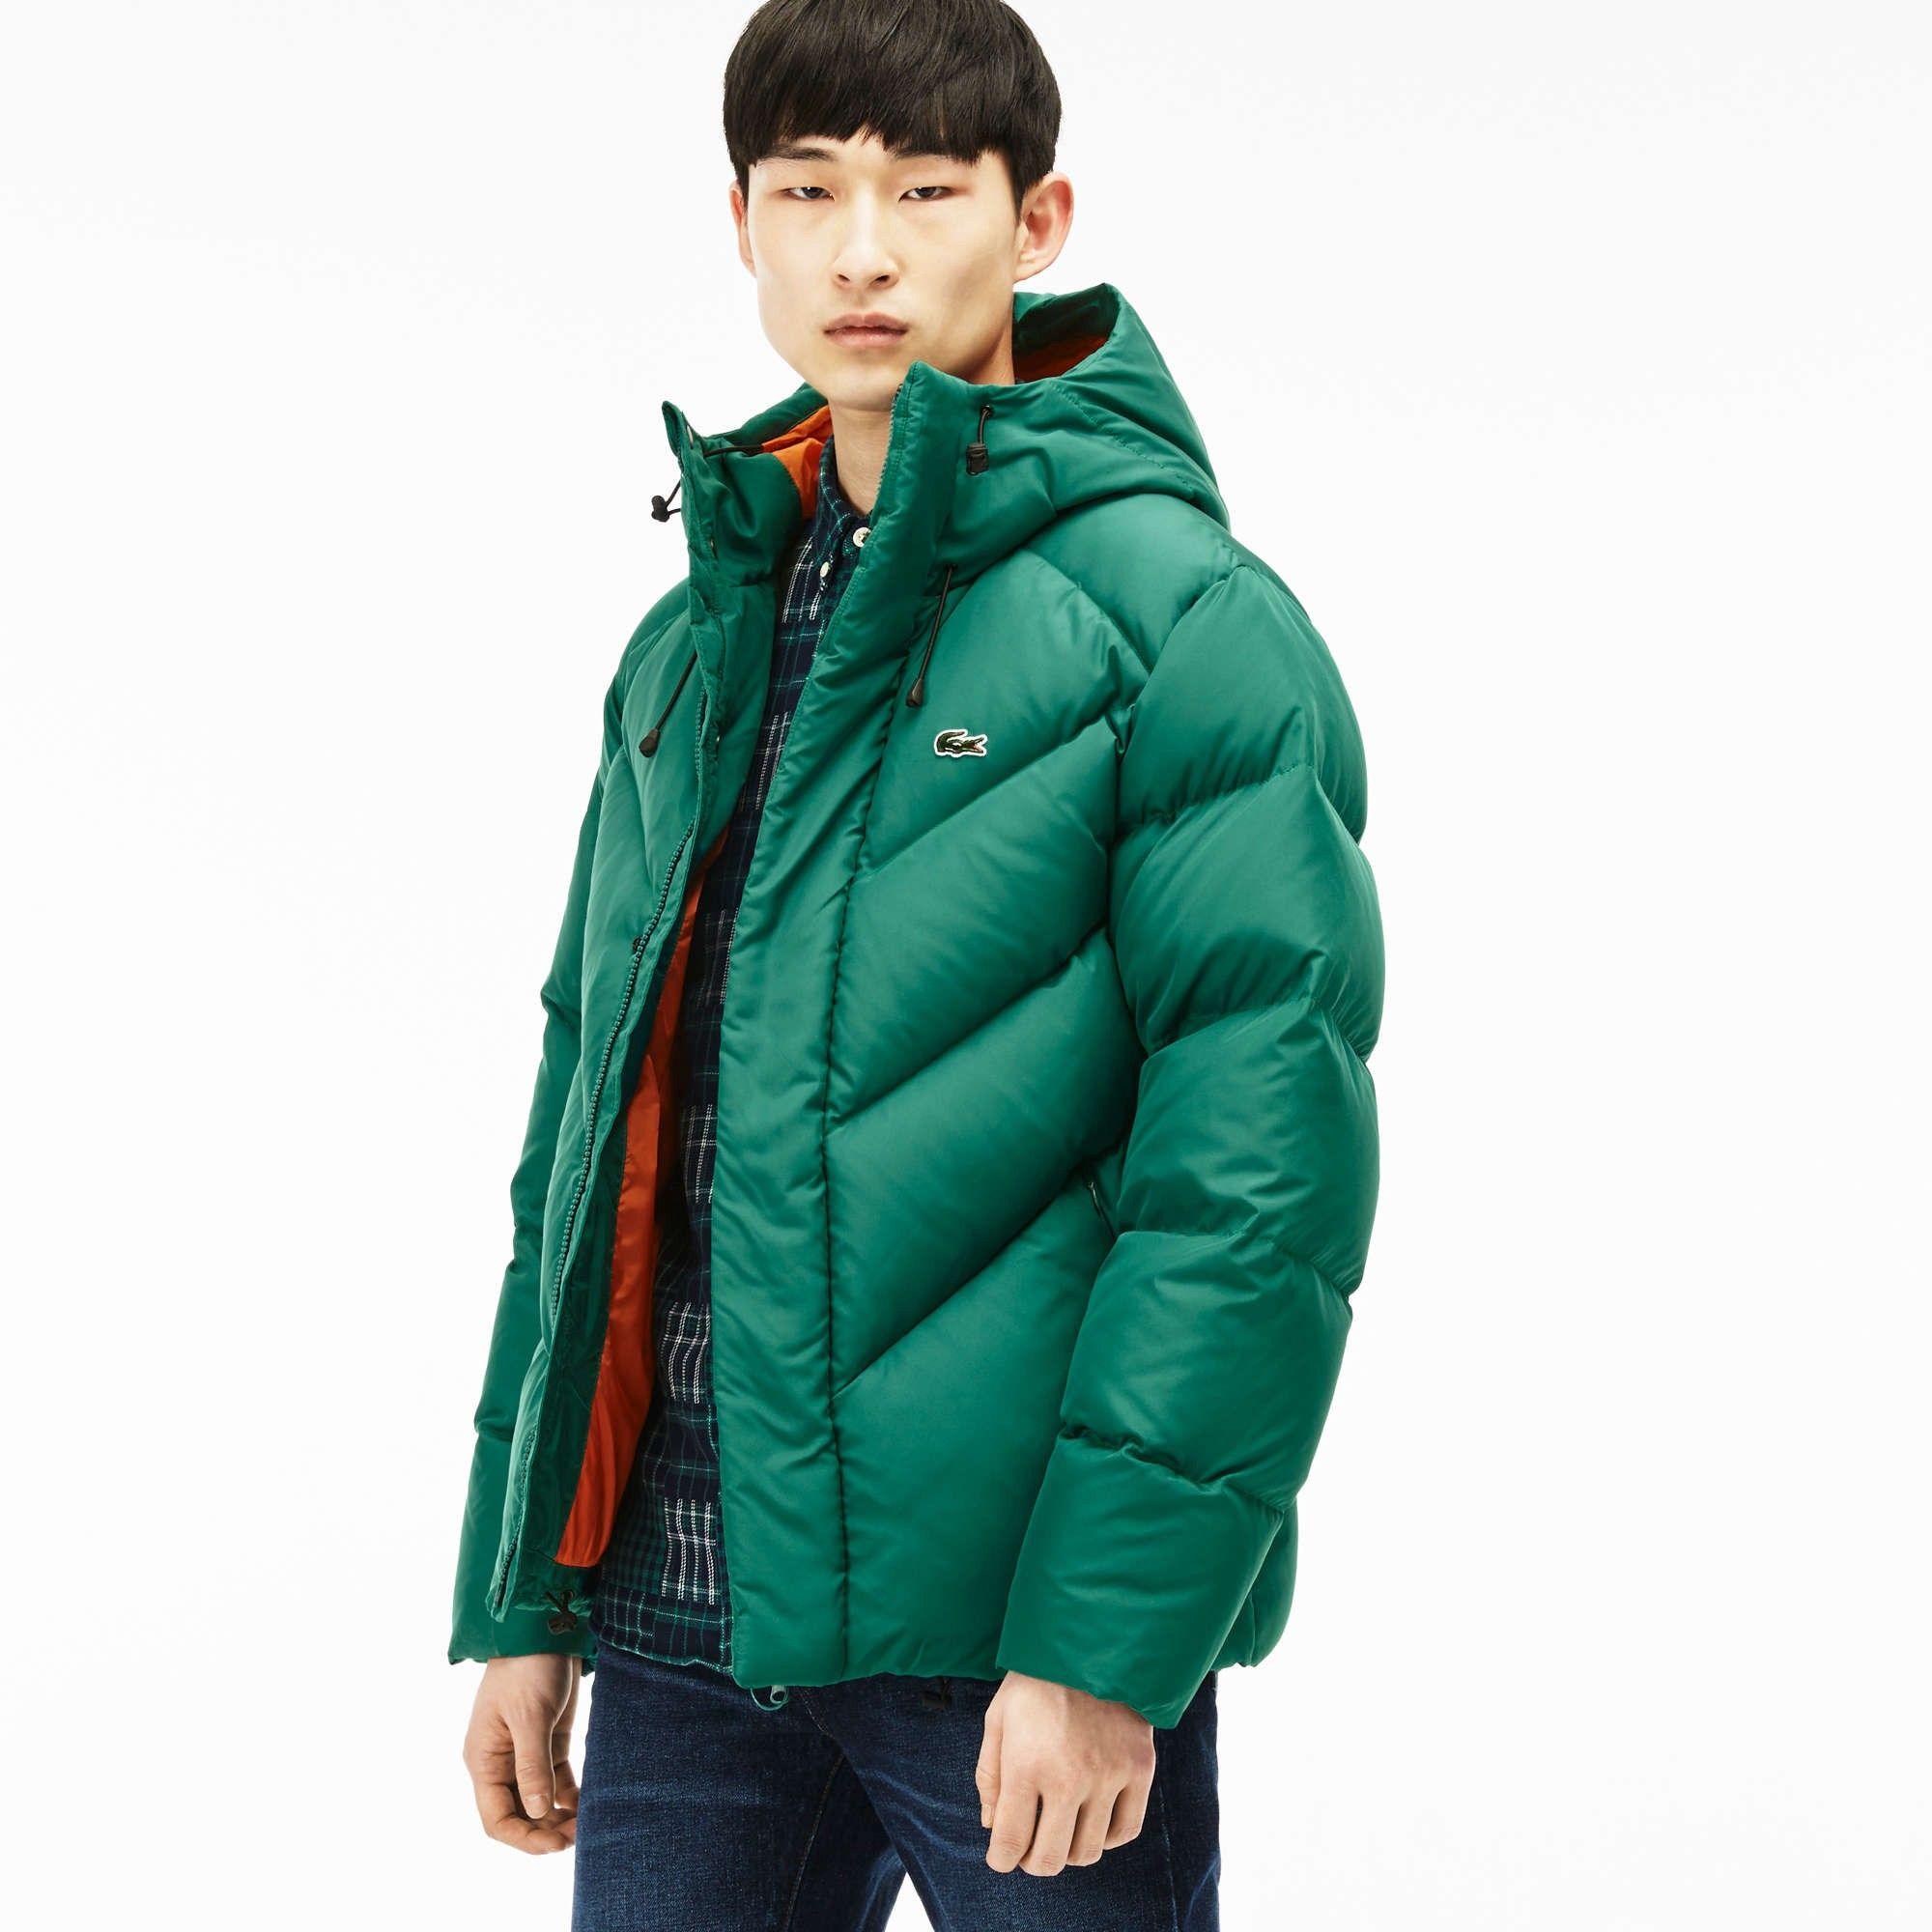 ddbbe3d6c41d75 LACOSTE Men S L!Ve Down Filled Jacket - Bottle Greenbottle Green.  lacoste   cloth  all